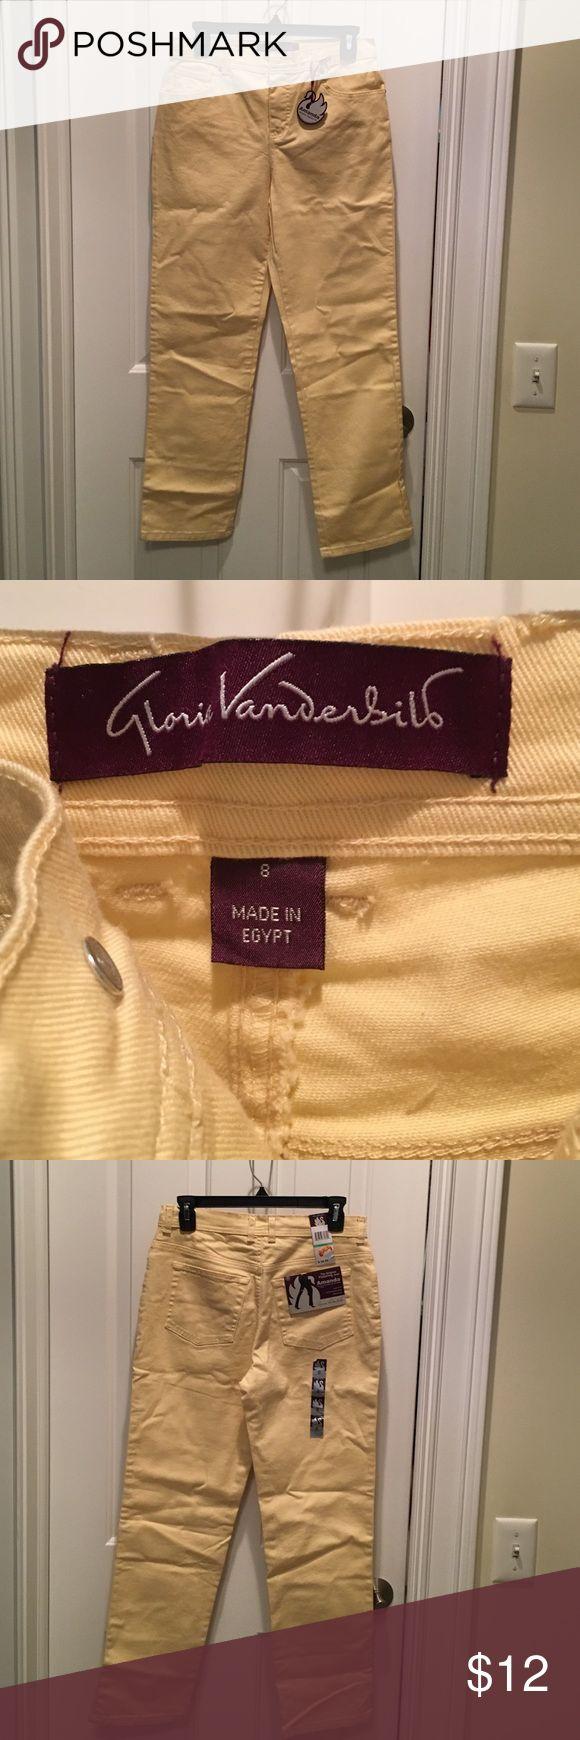 Gloria Vanderbilt Yellow Amanda Jeans Size 8 Short Gloria Vanderbilt yellow Amanda jeans, size 8 short with straight legs.  NWT.  98% cotton, 2% spandex.  Perfect for spring and summer! Gloria Vanderbilt Jeans Straight Leg